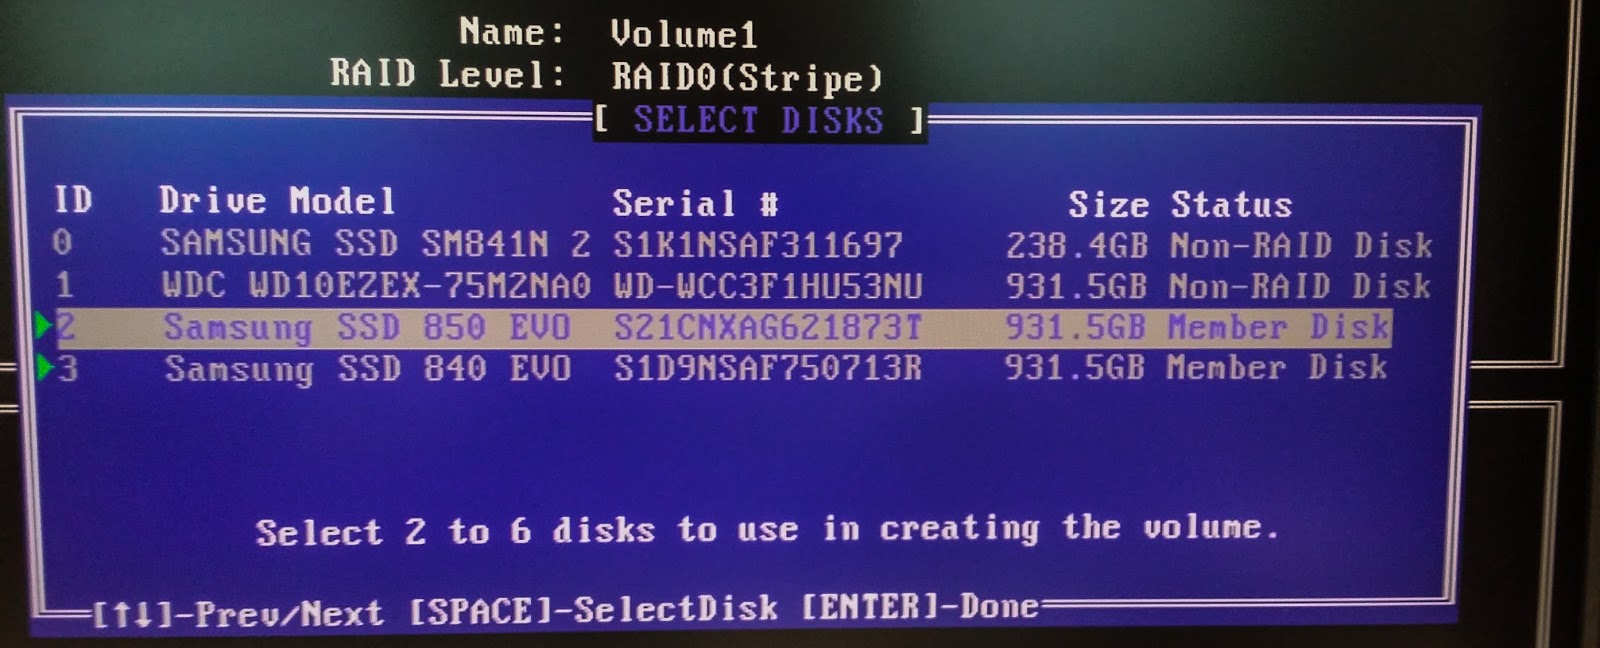 How to setup RAID 0 with SSD, Step by step giude ~ Code Ketchup